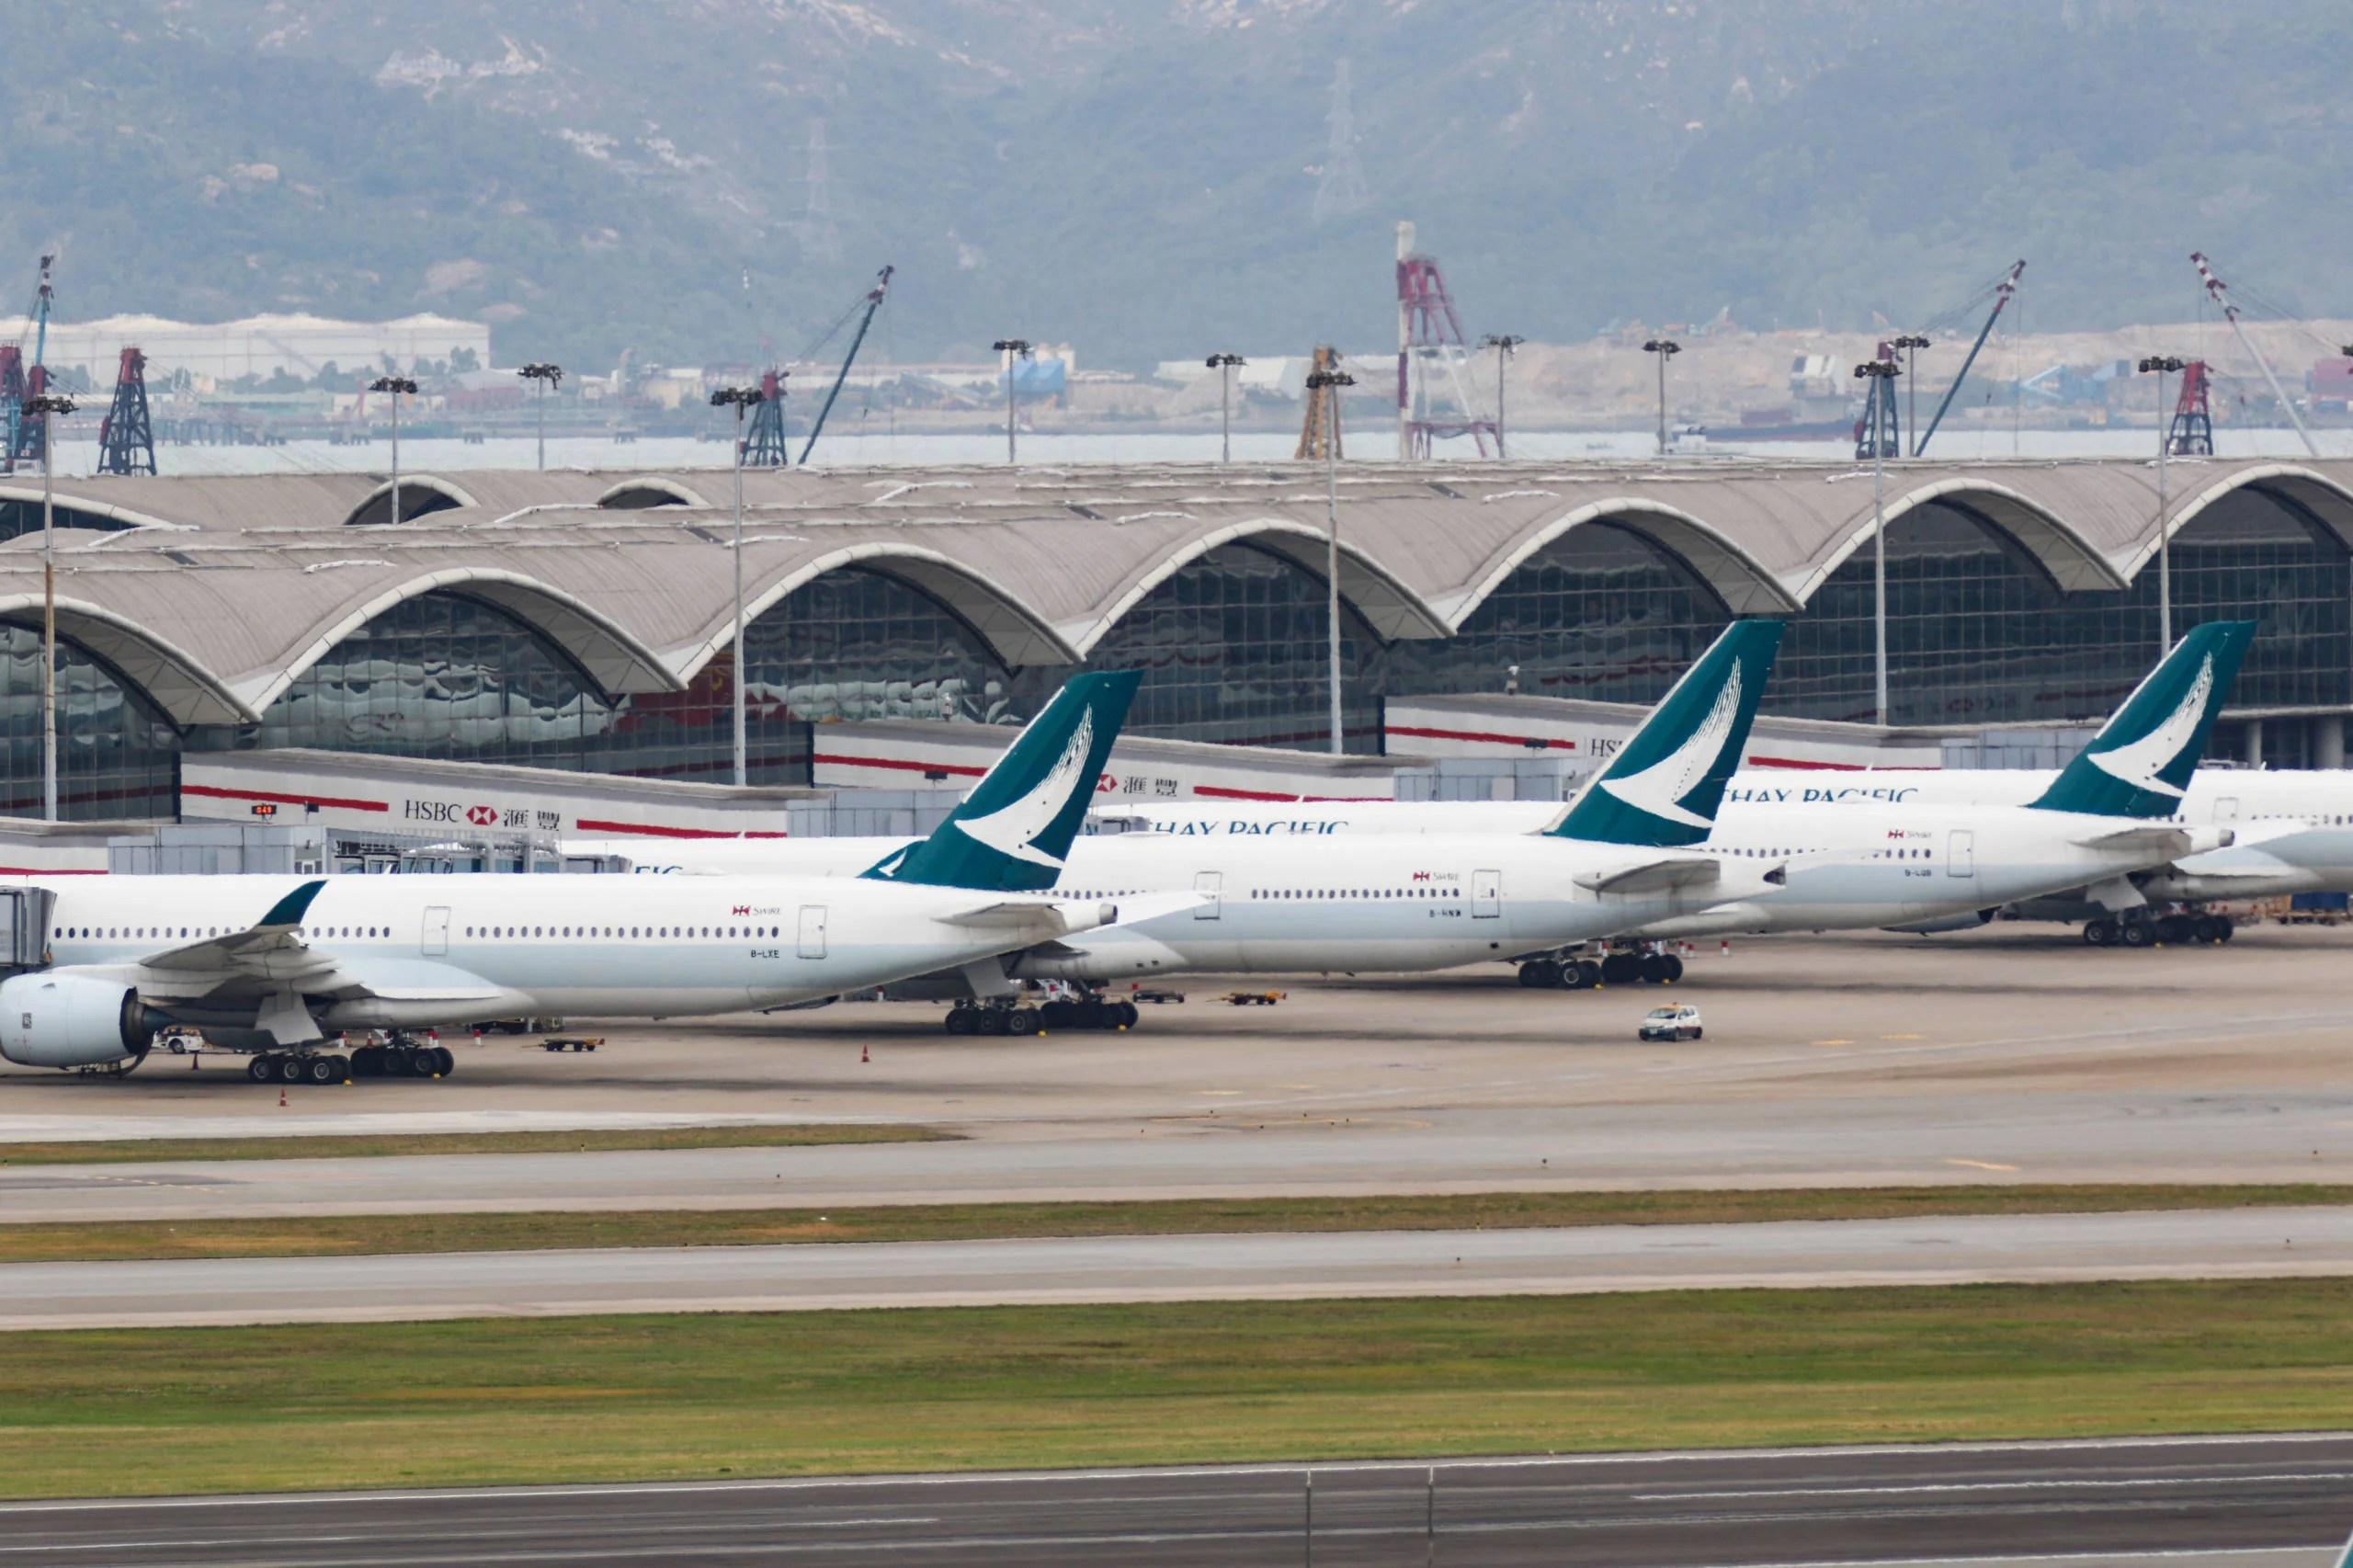 Hong Kong reopens to transit passengers in June